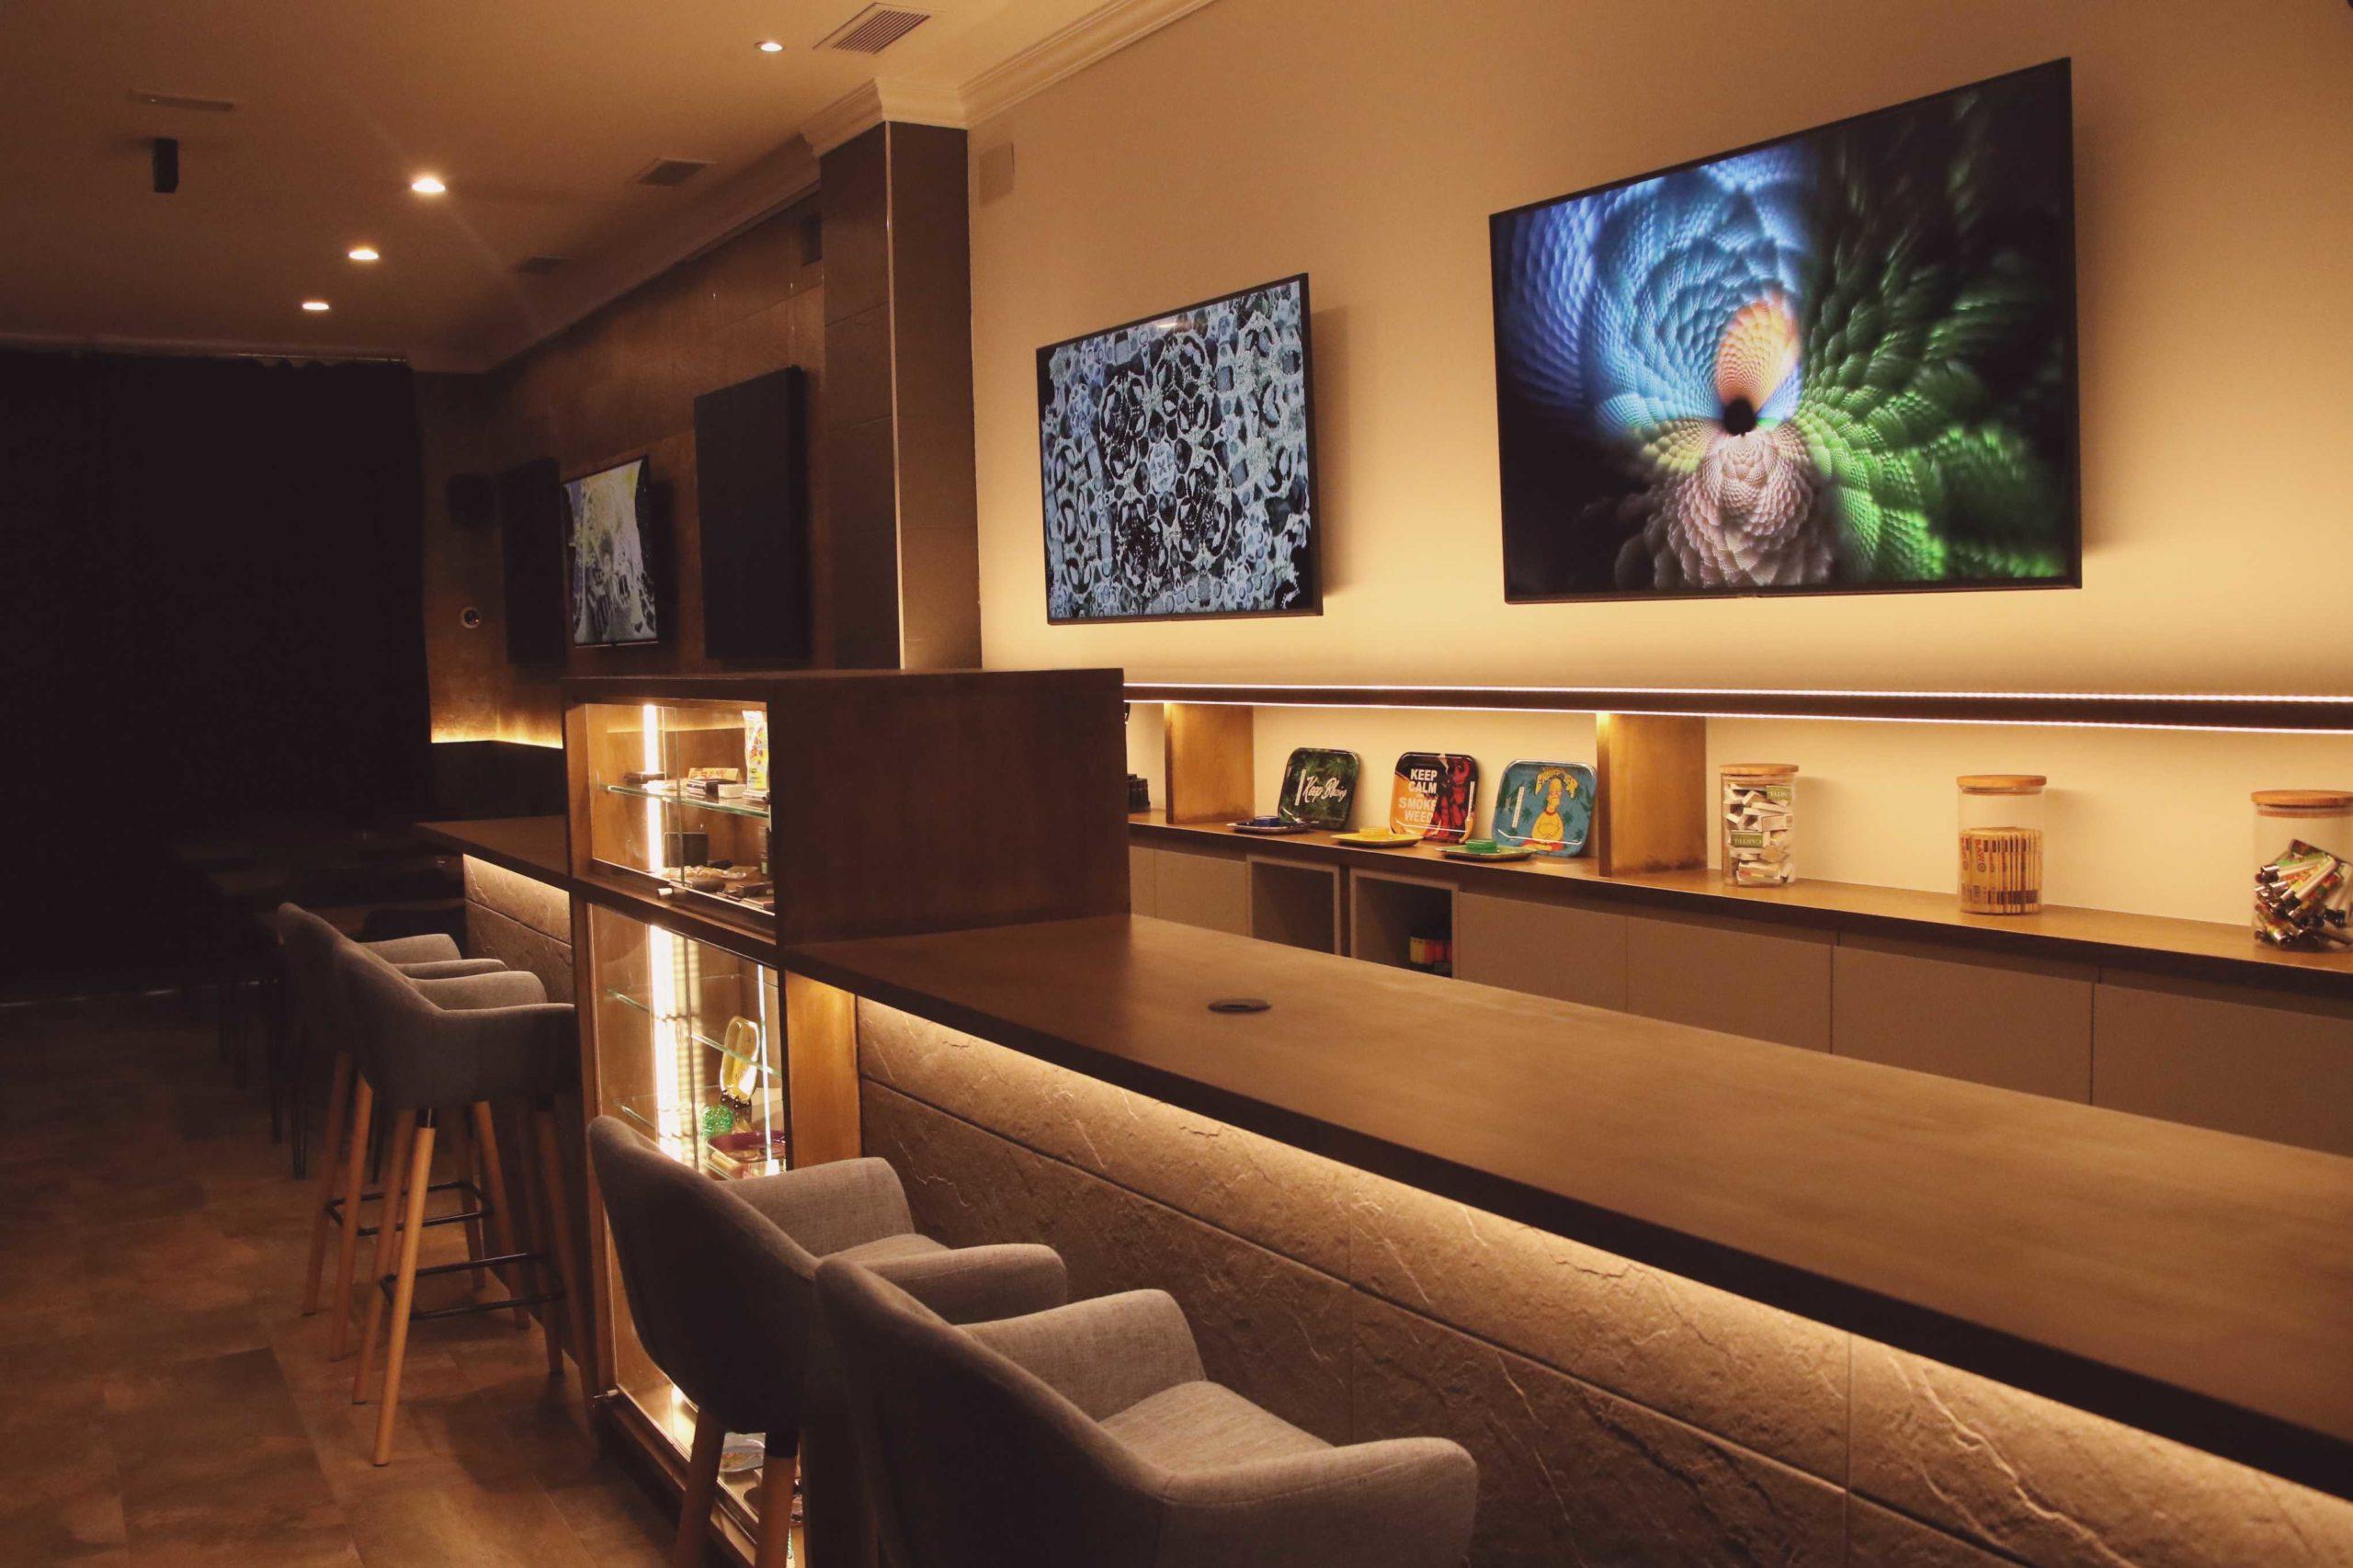 barcelona coffeeshop bar with screens on the wall